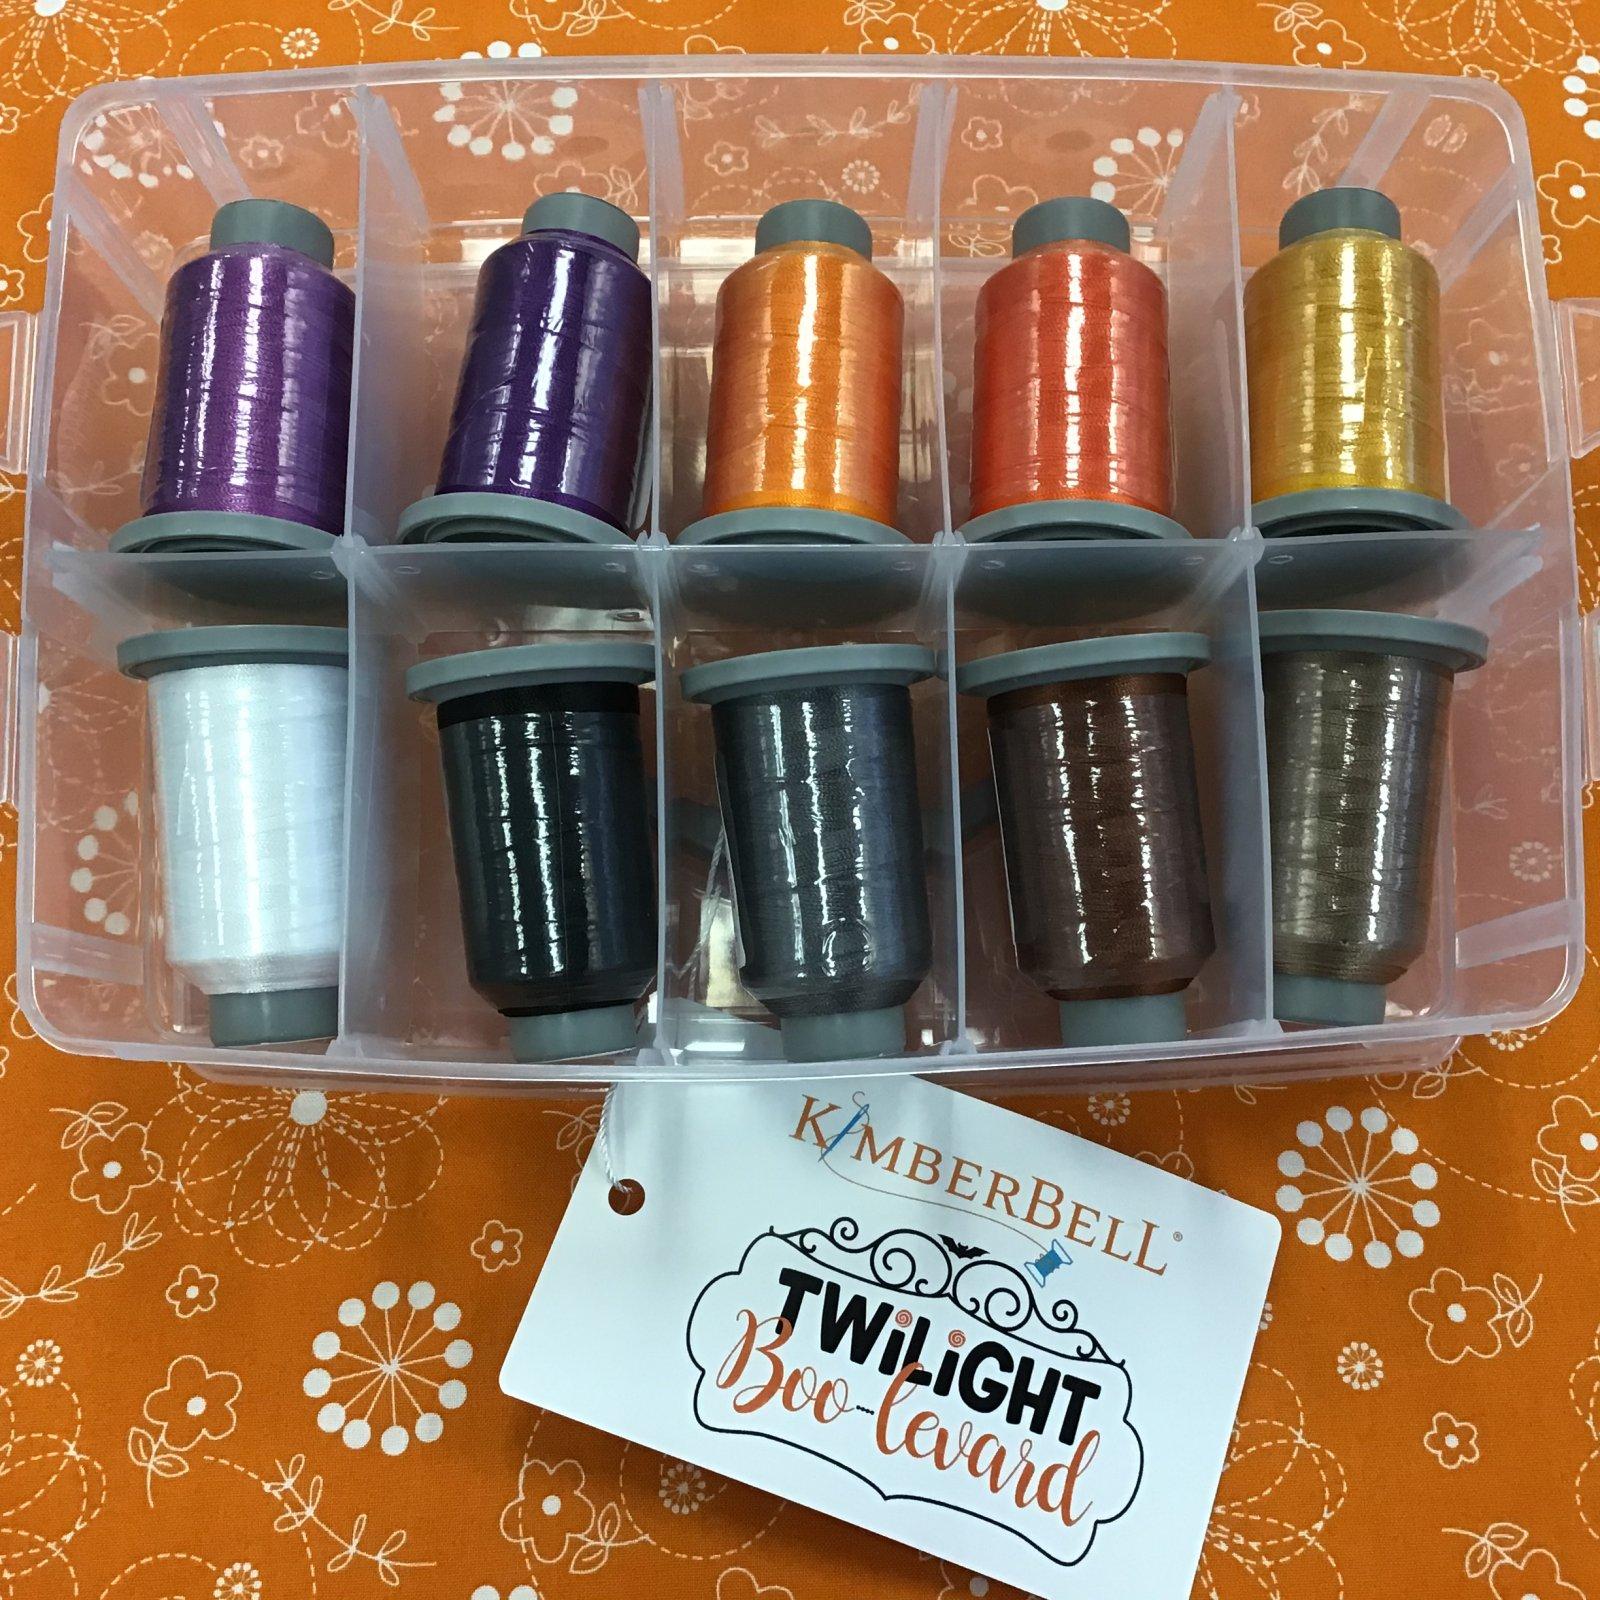 Glide Kimberbell Twilight Boo-levard Thread Collection